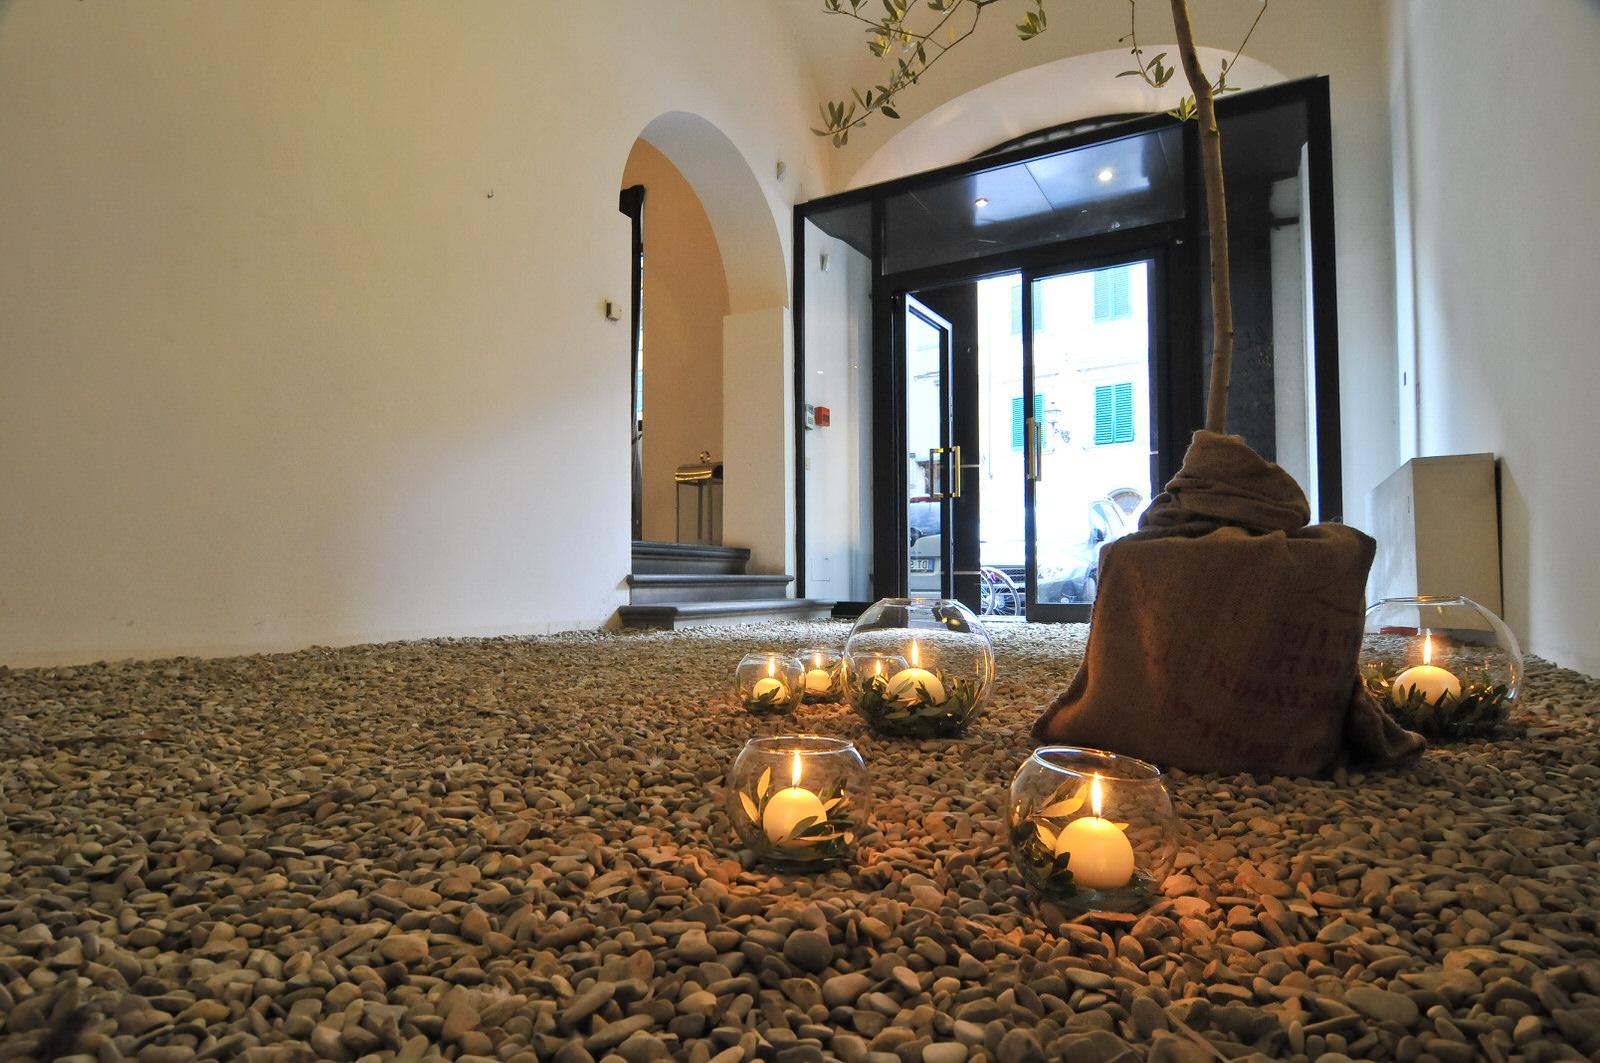 tuscany-wedding-planners-floristen-18.jpg